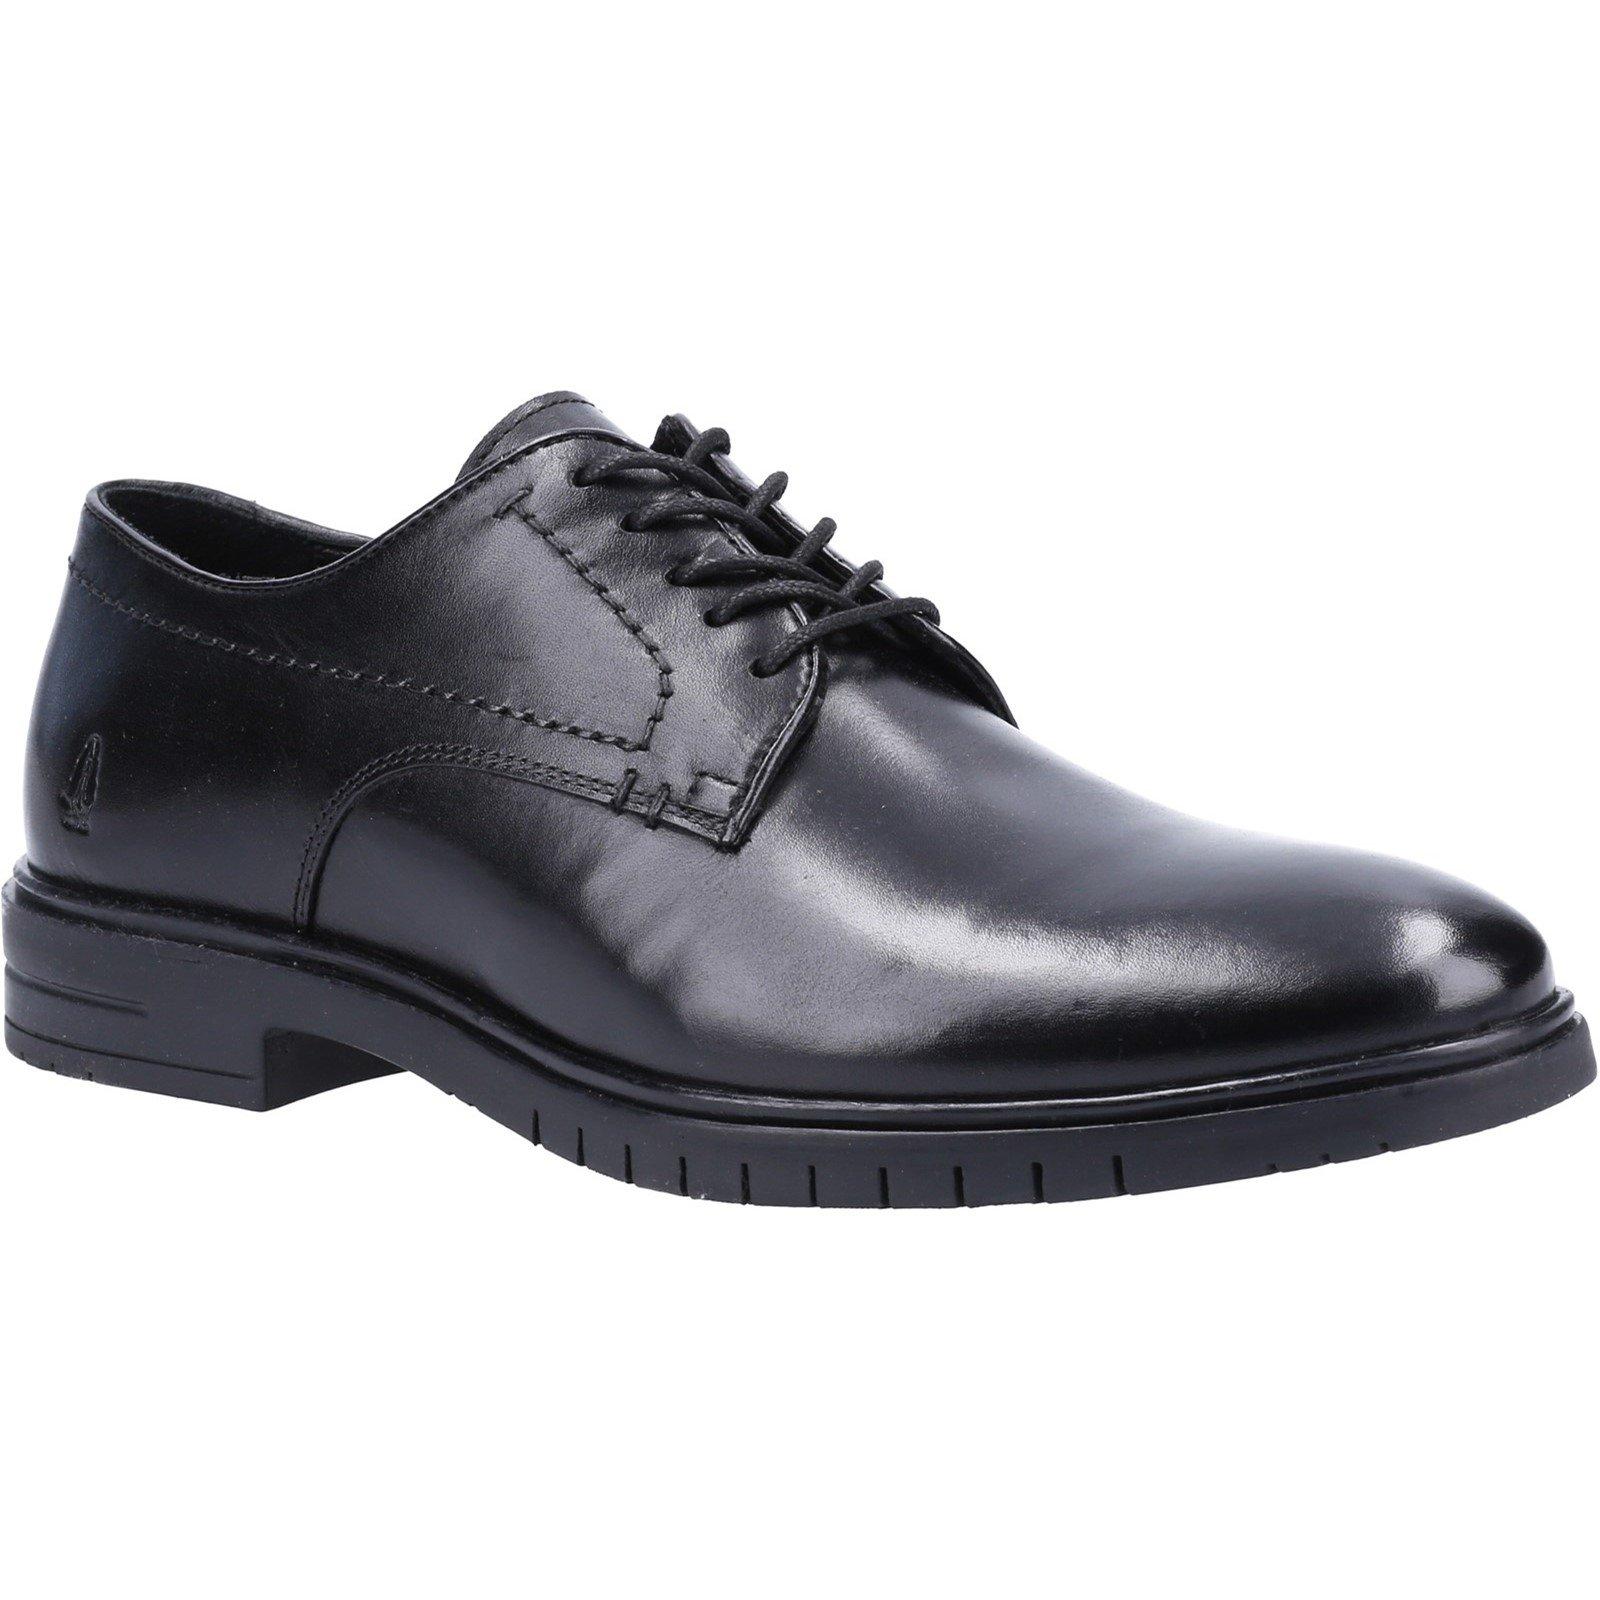 Hush Puppies Men's Sterling Lace Derby Shoe Black 31992 - Black 10